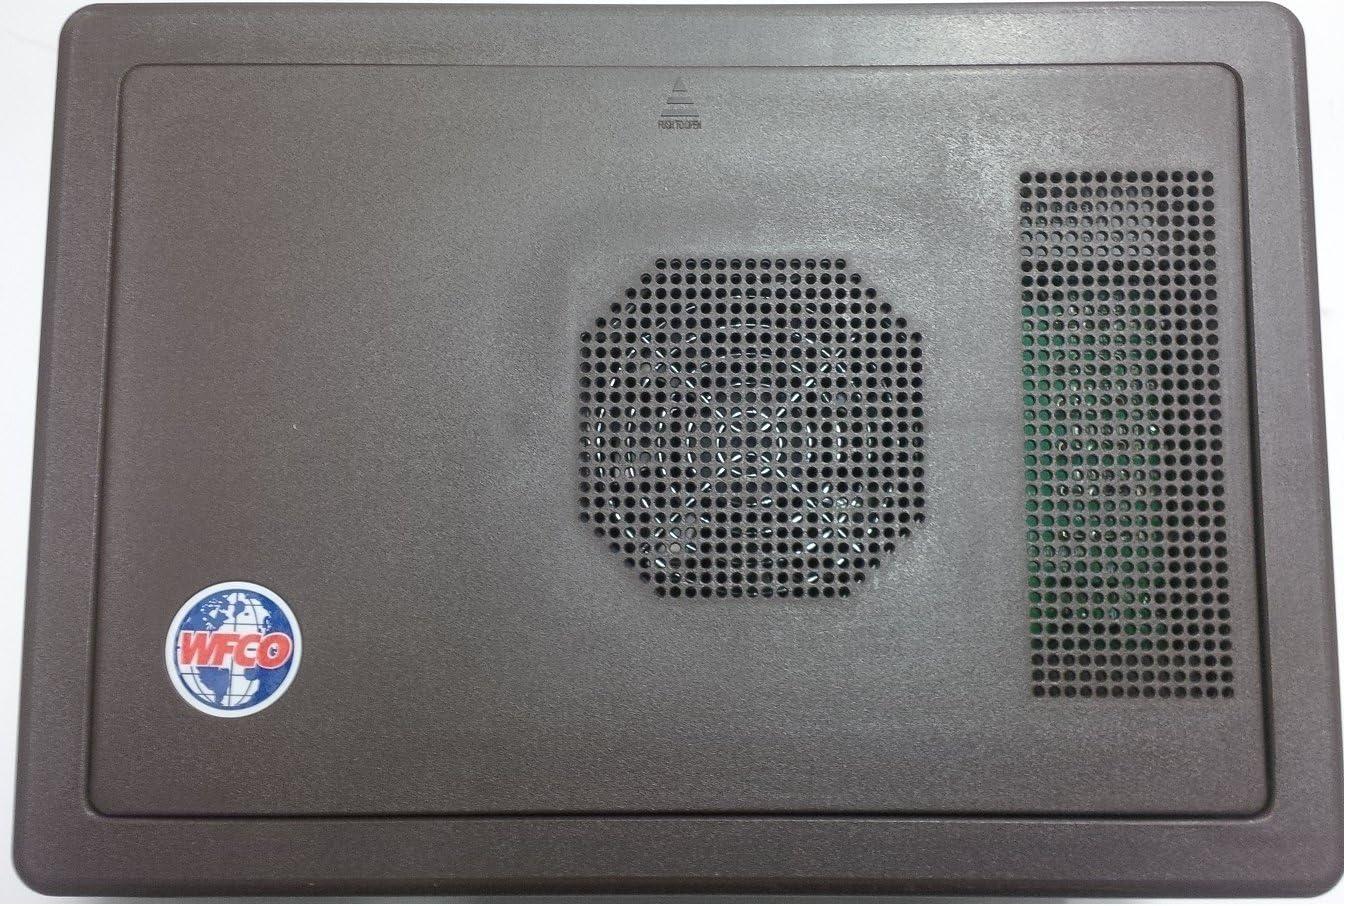 Black WFCO WF-8740PB WF-8700 Series Power Center Converter Charger 40 Amp